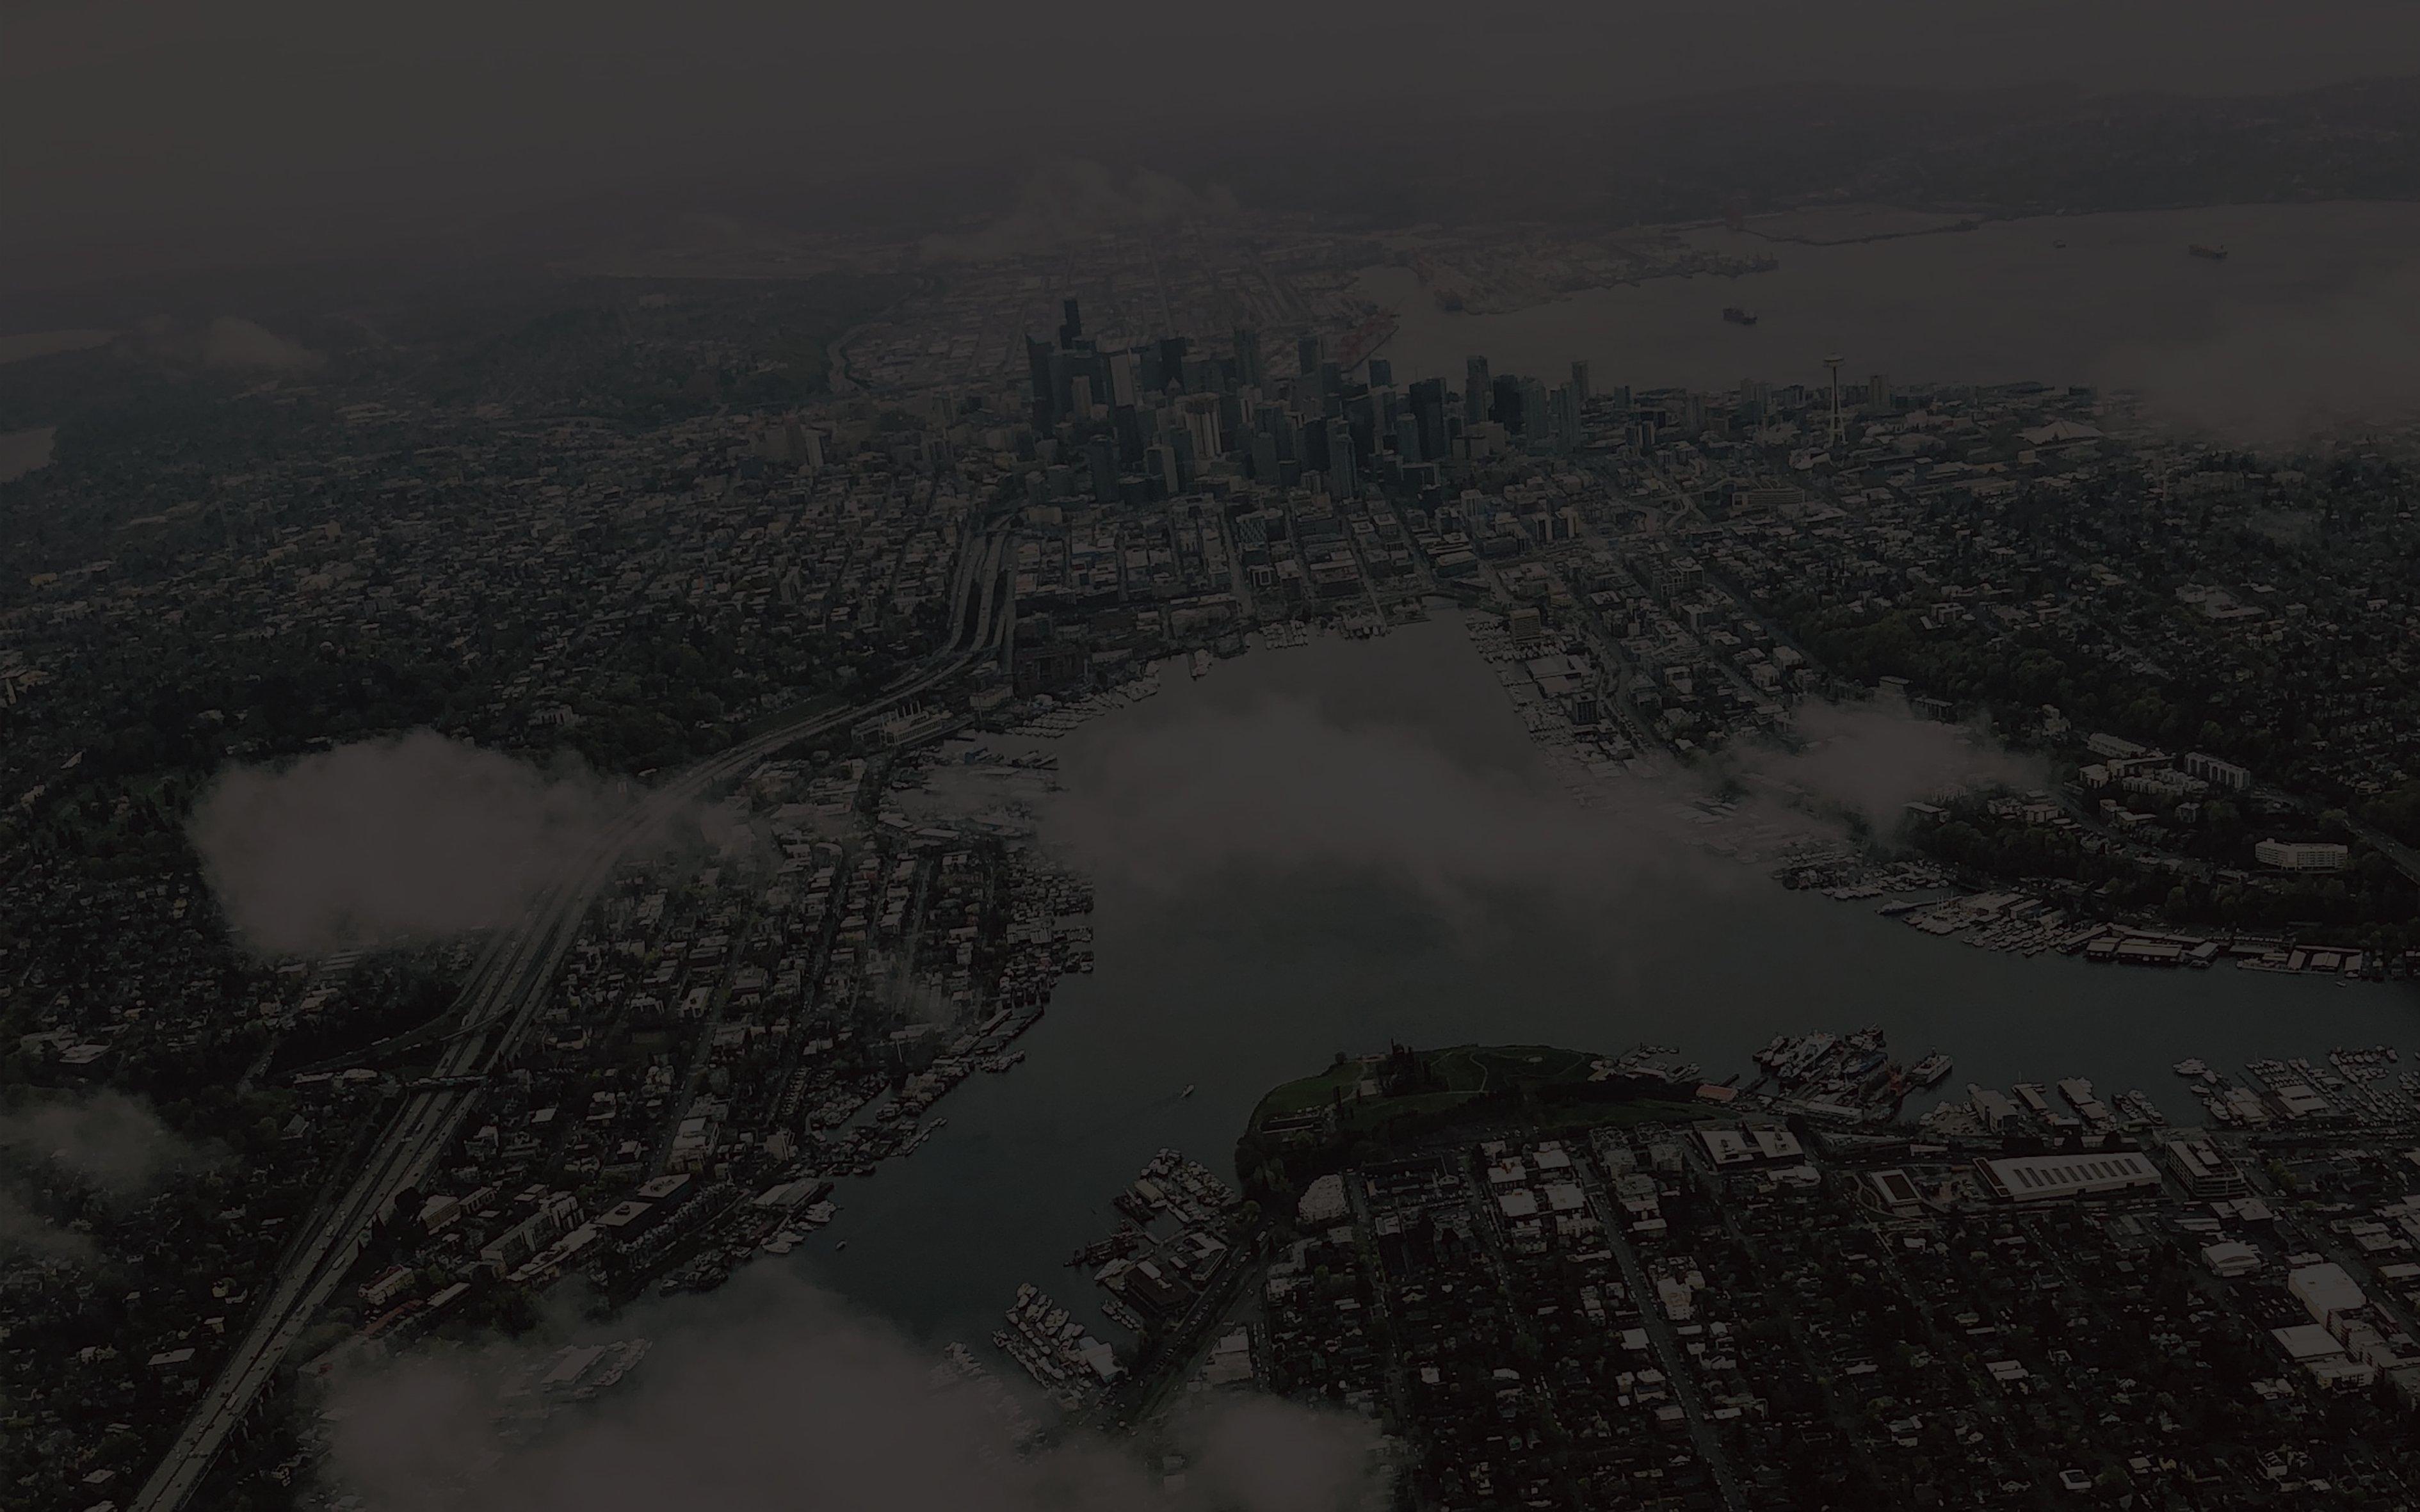 Seattle city image